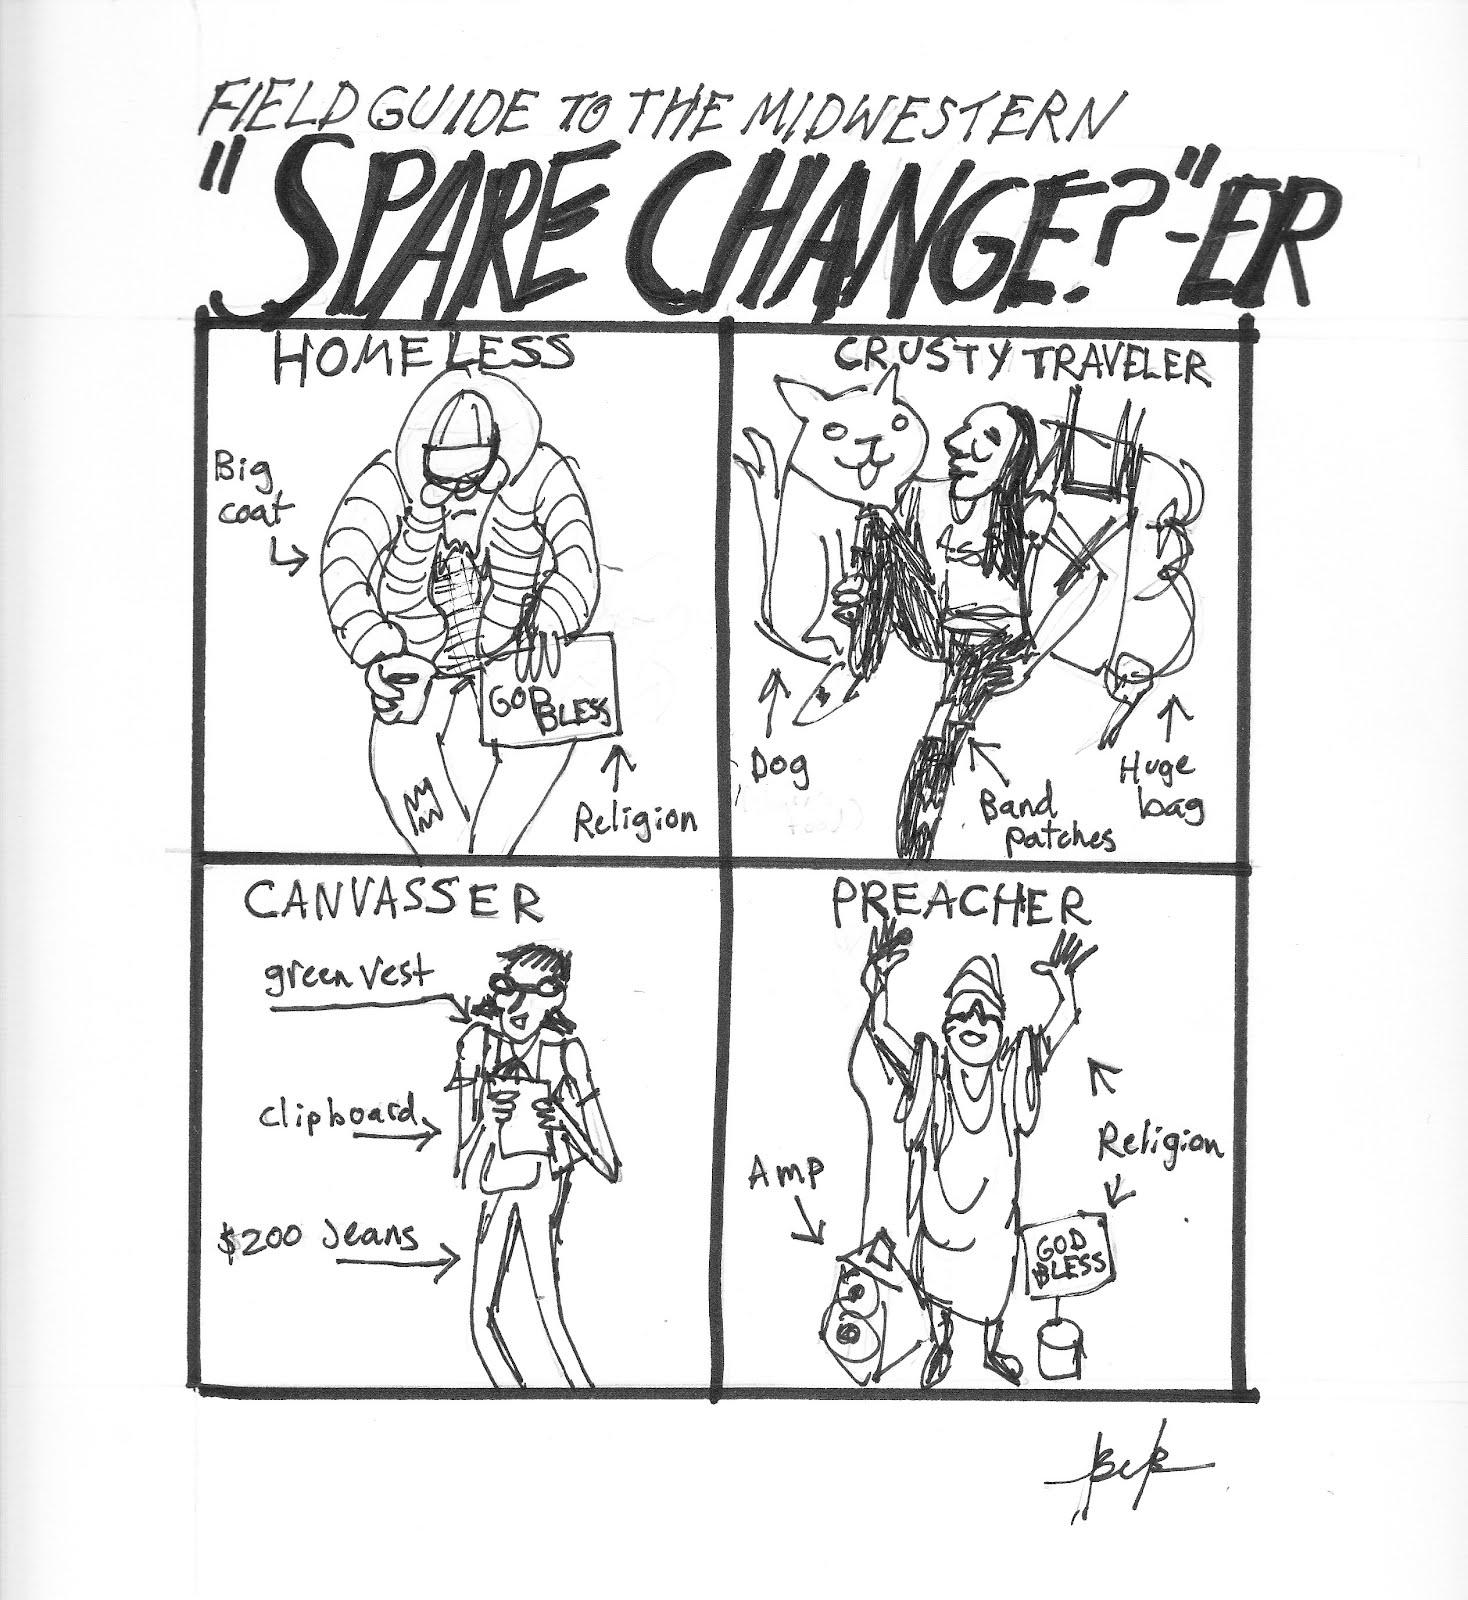 Comic by Beck Kilkenny.